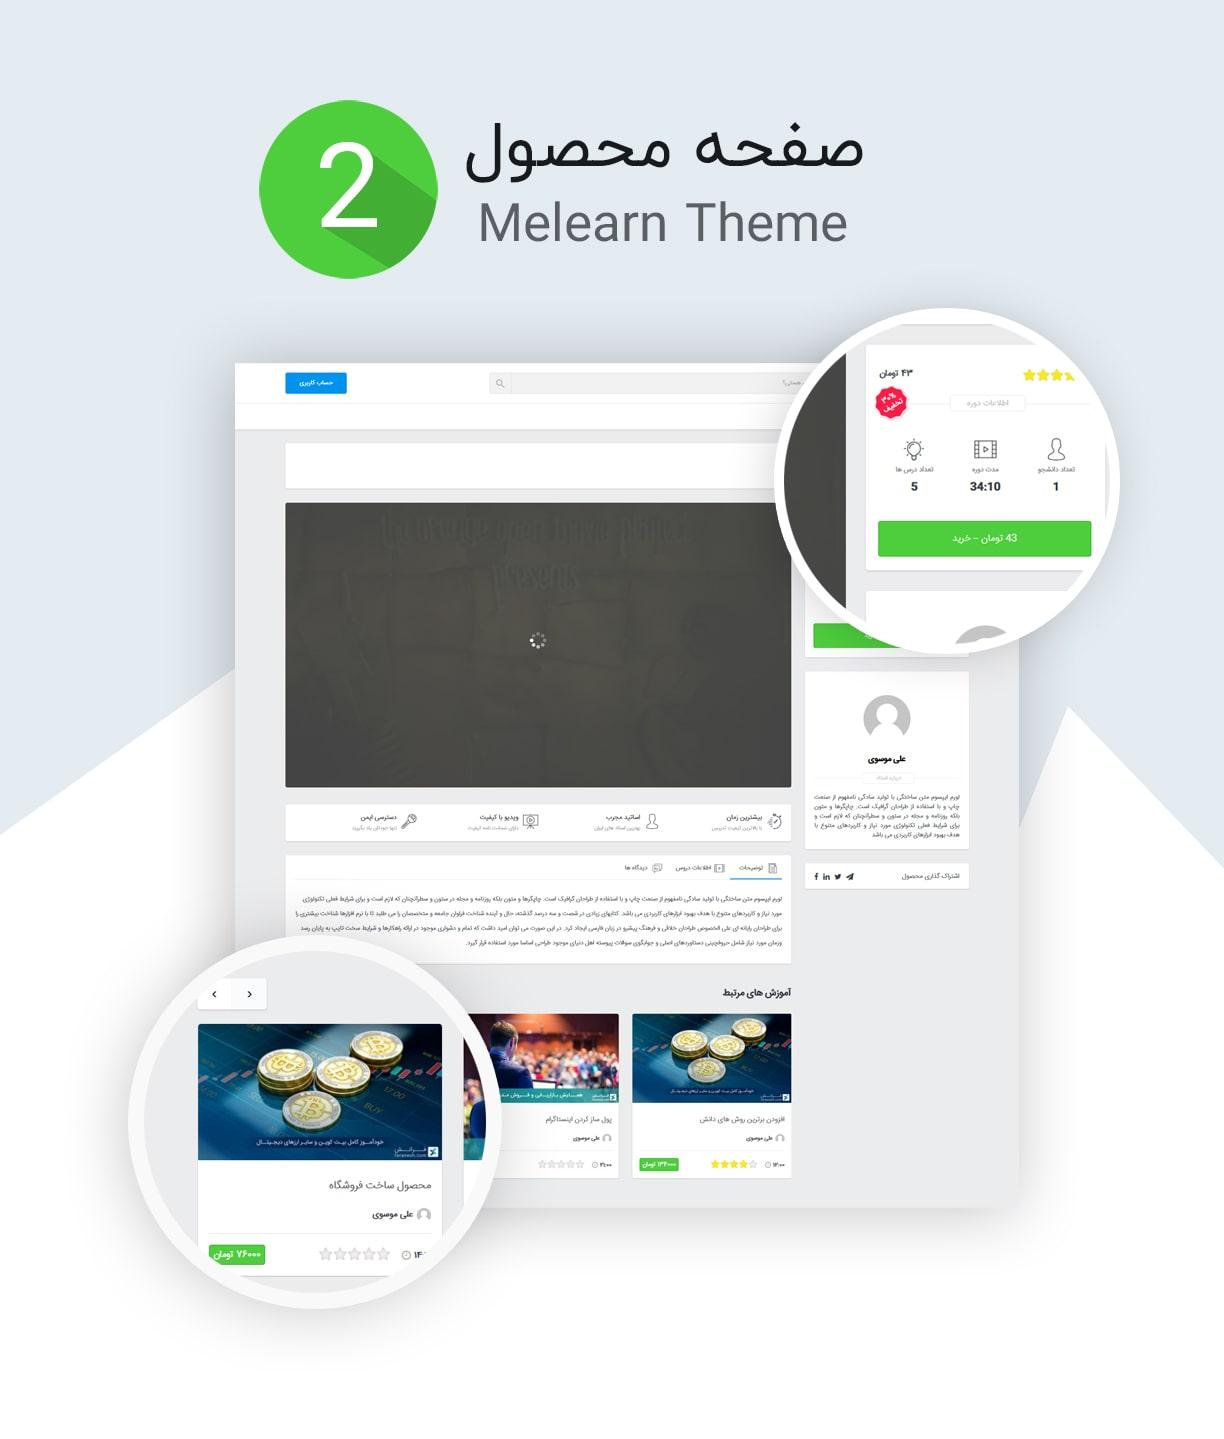 قالب وردپرس فروش فایل میلرن